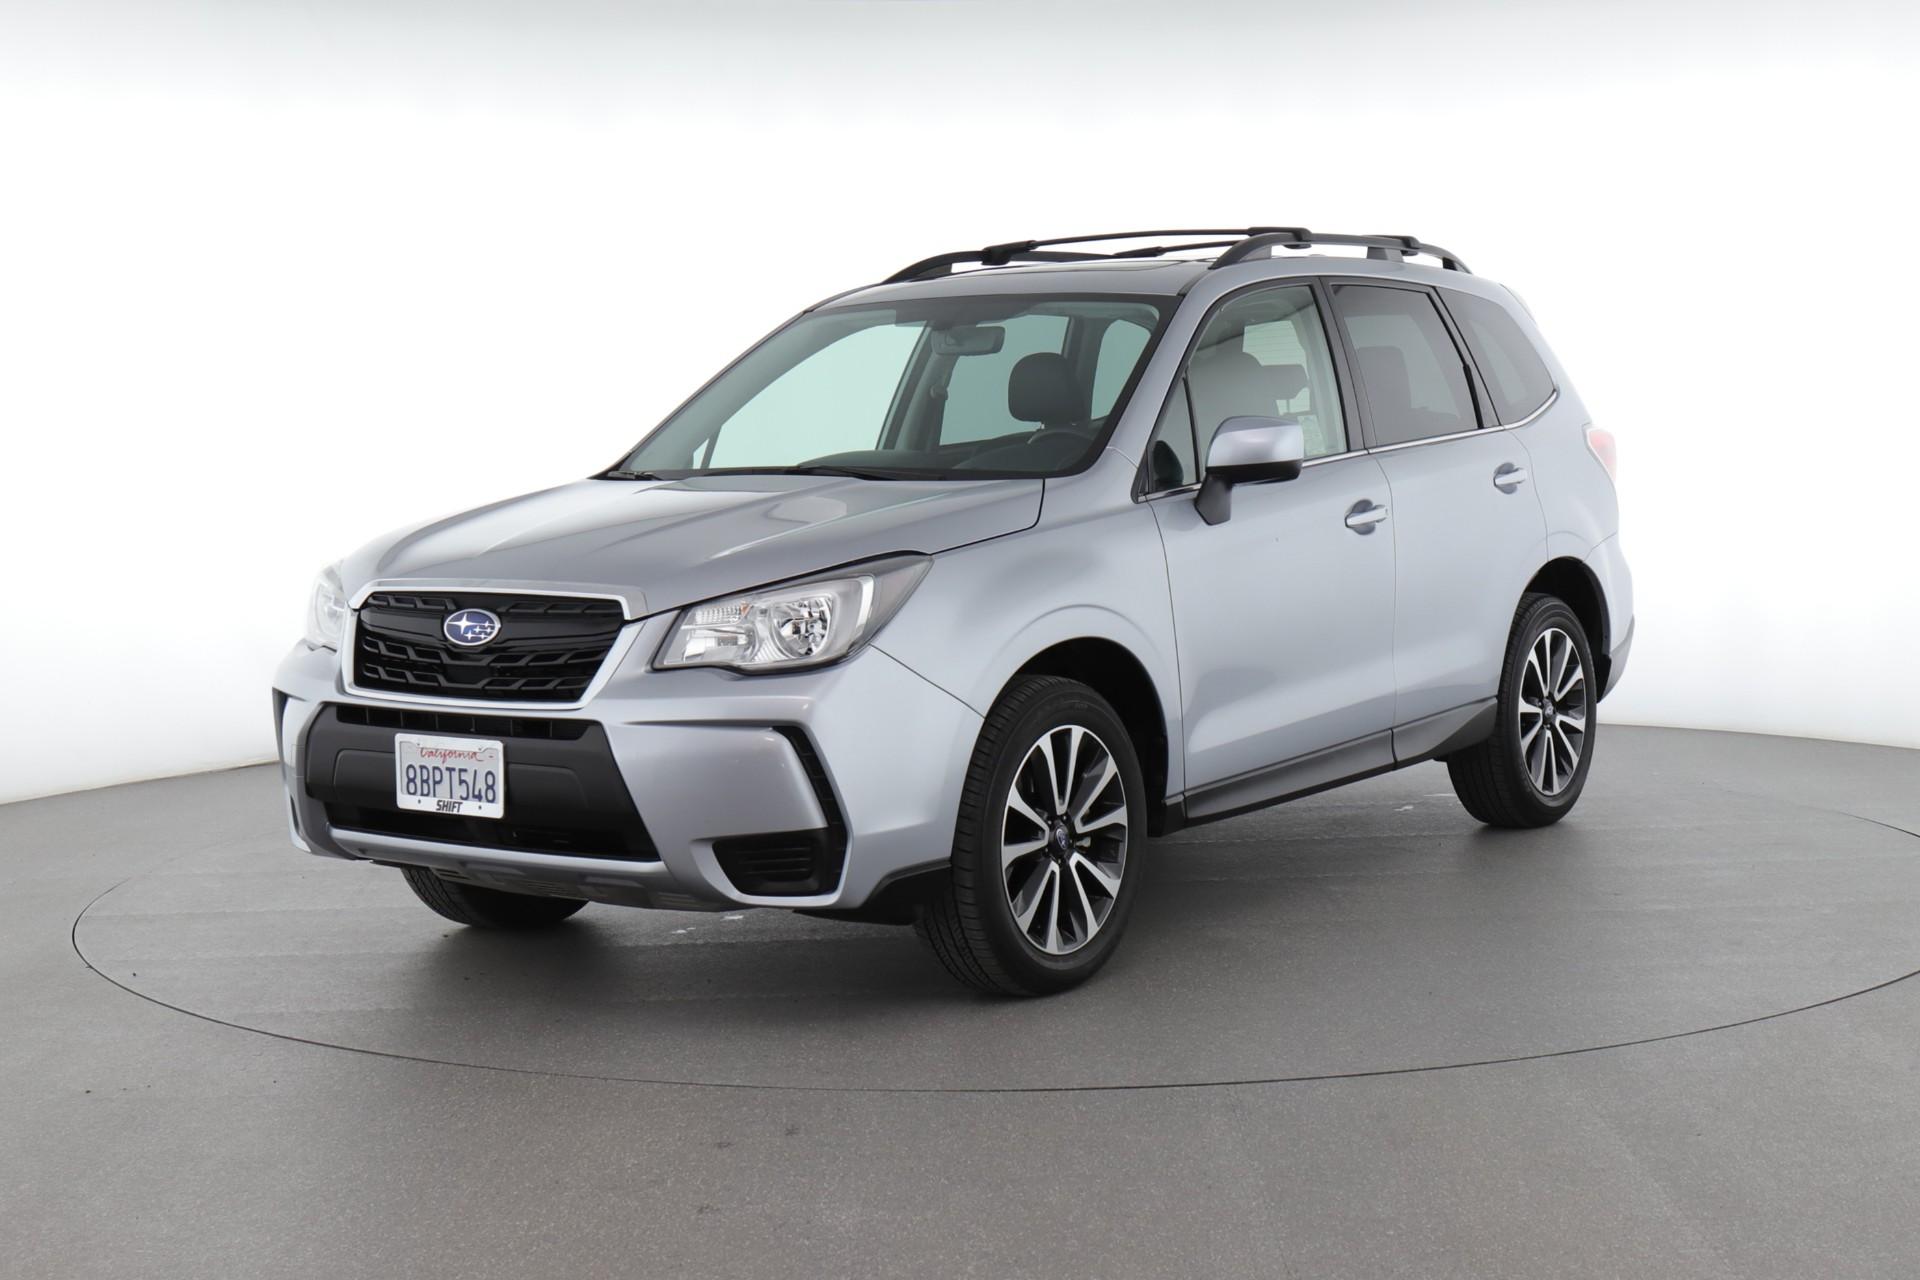 Subaru Forester Premium (from $26,500)